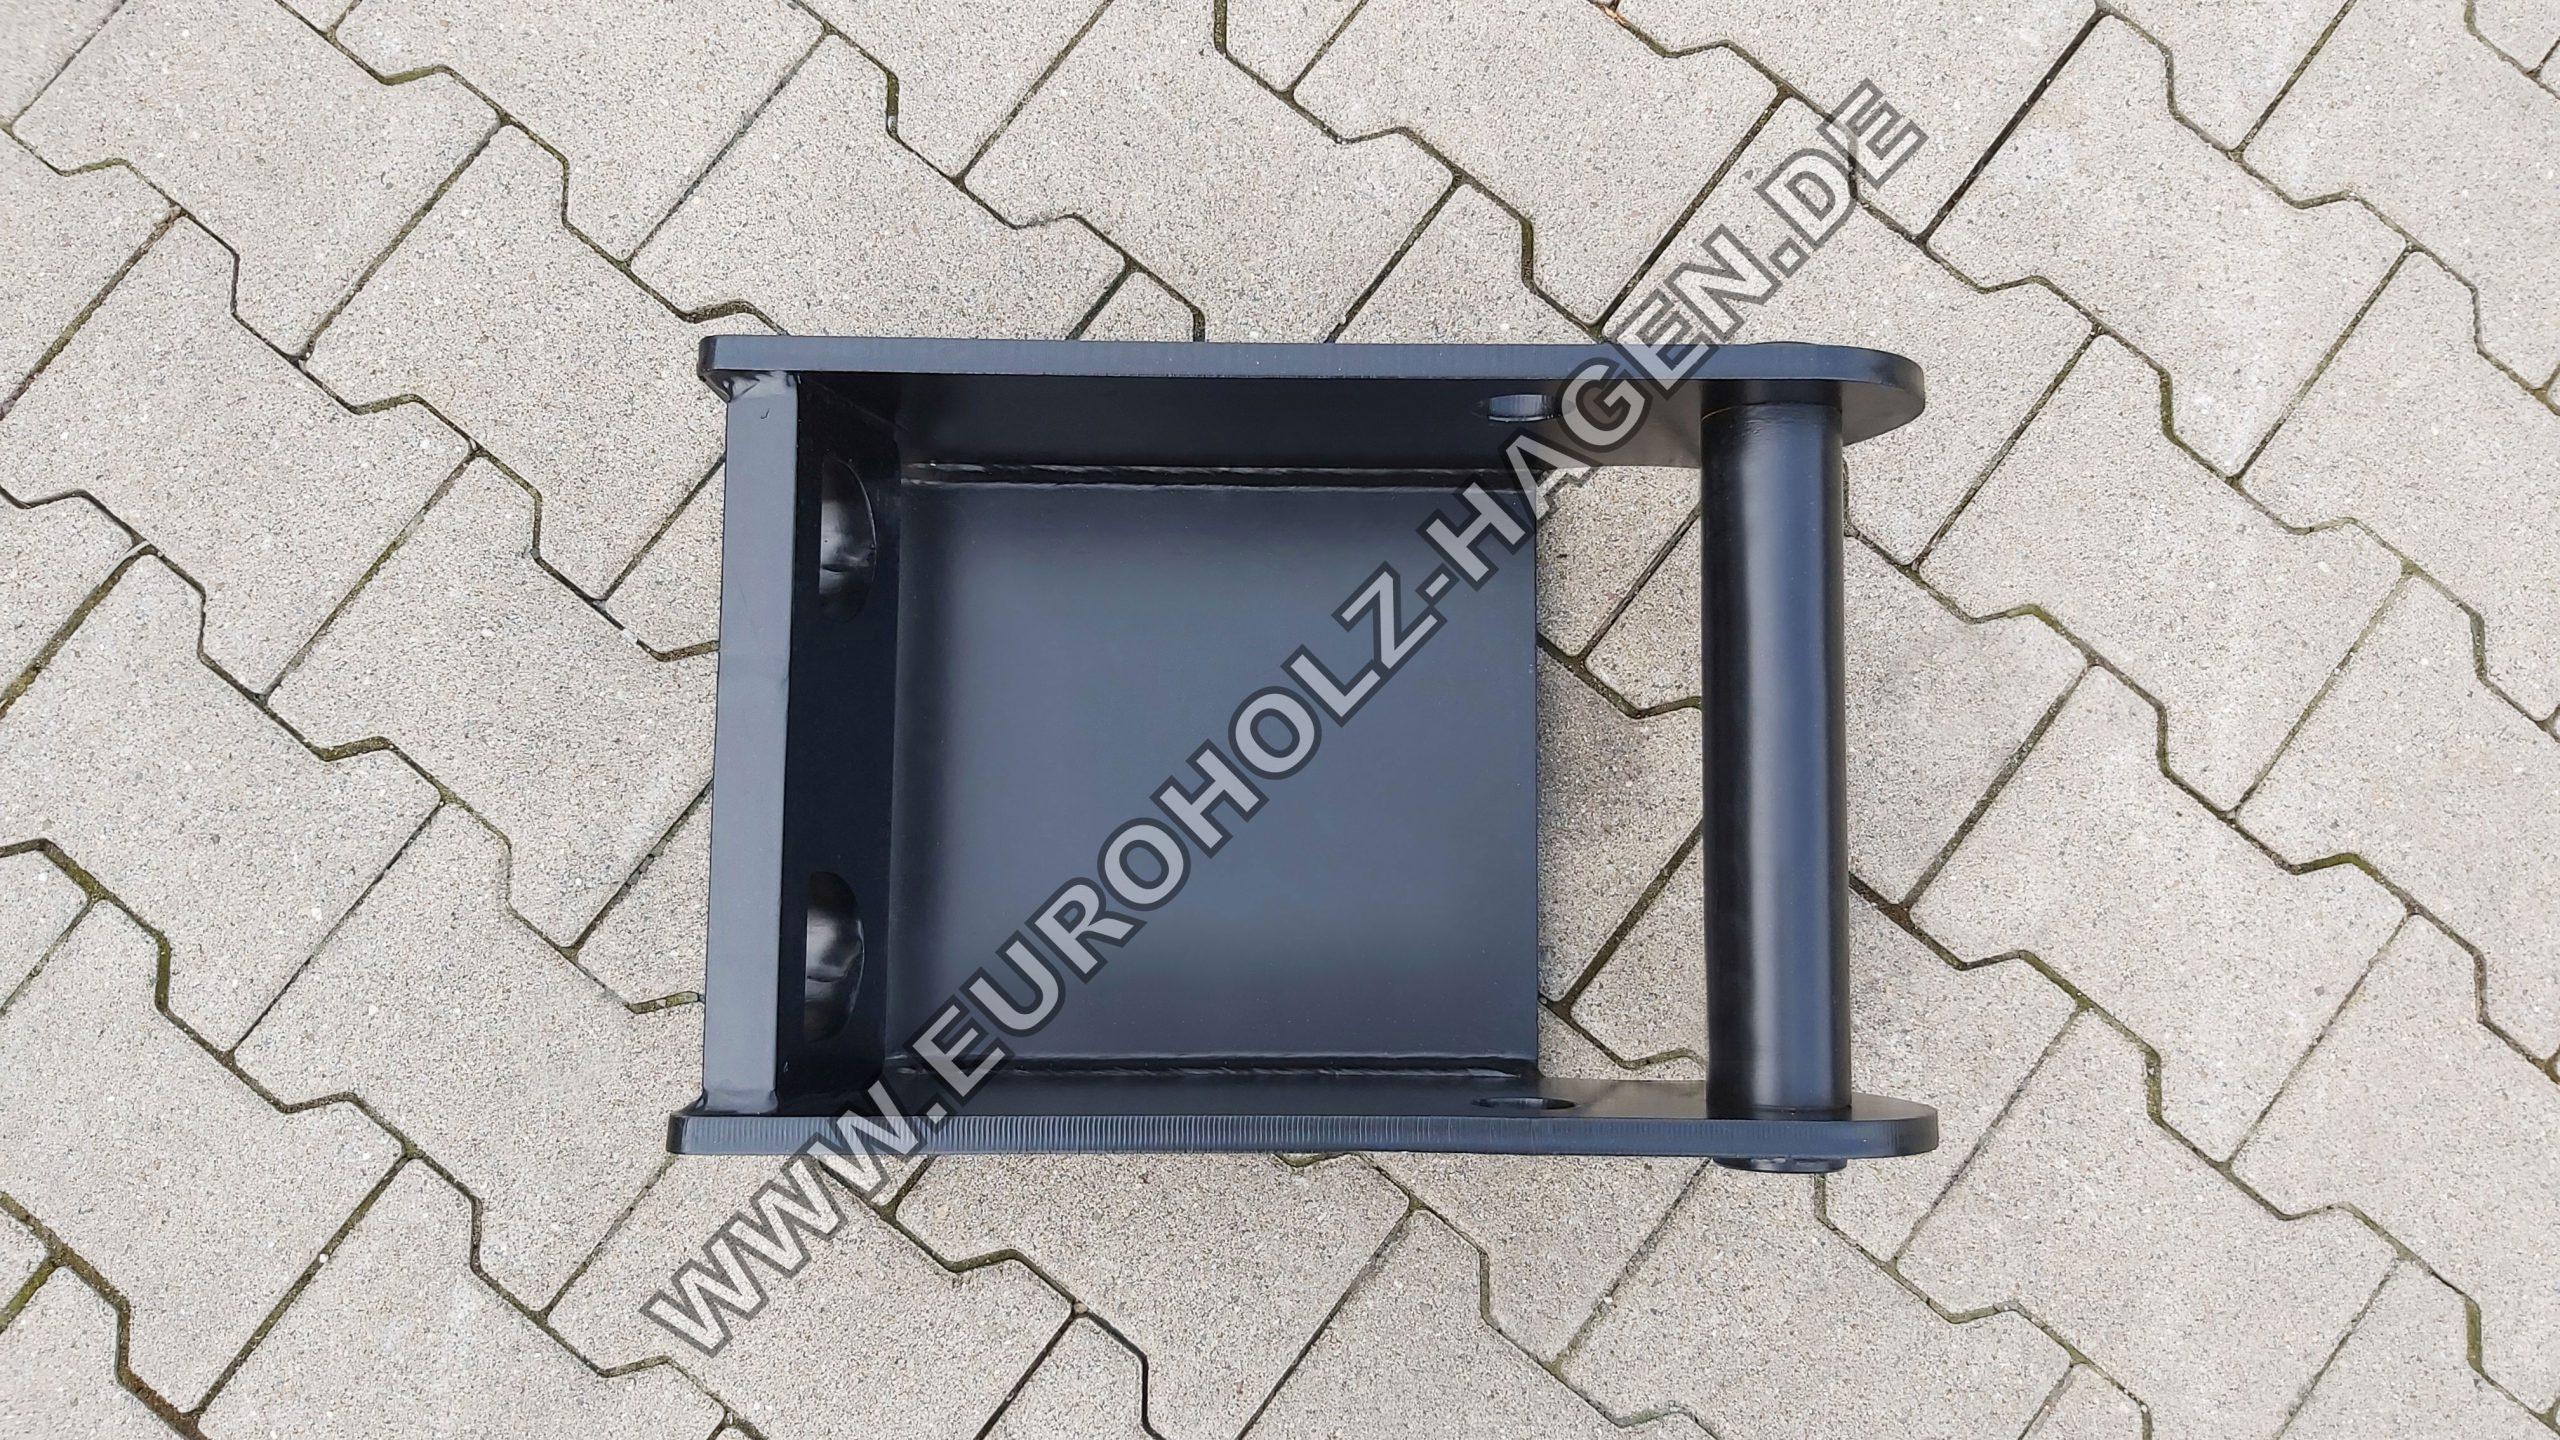 Hammerplatte MS08 Lehnhoff Hammerplatten Löffel Bagger Platte CW mit Boden EH eh Euroholz